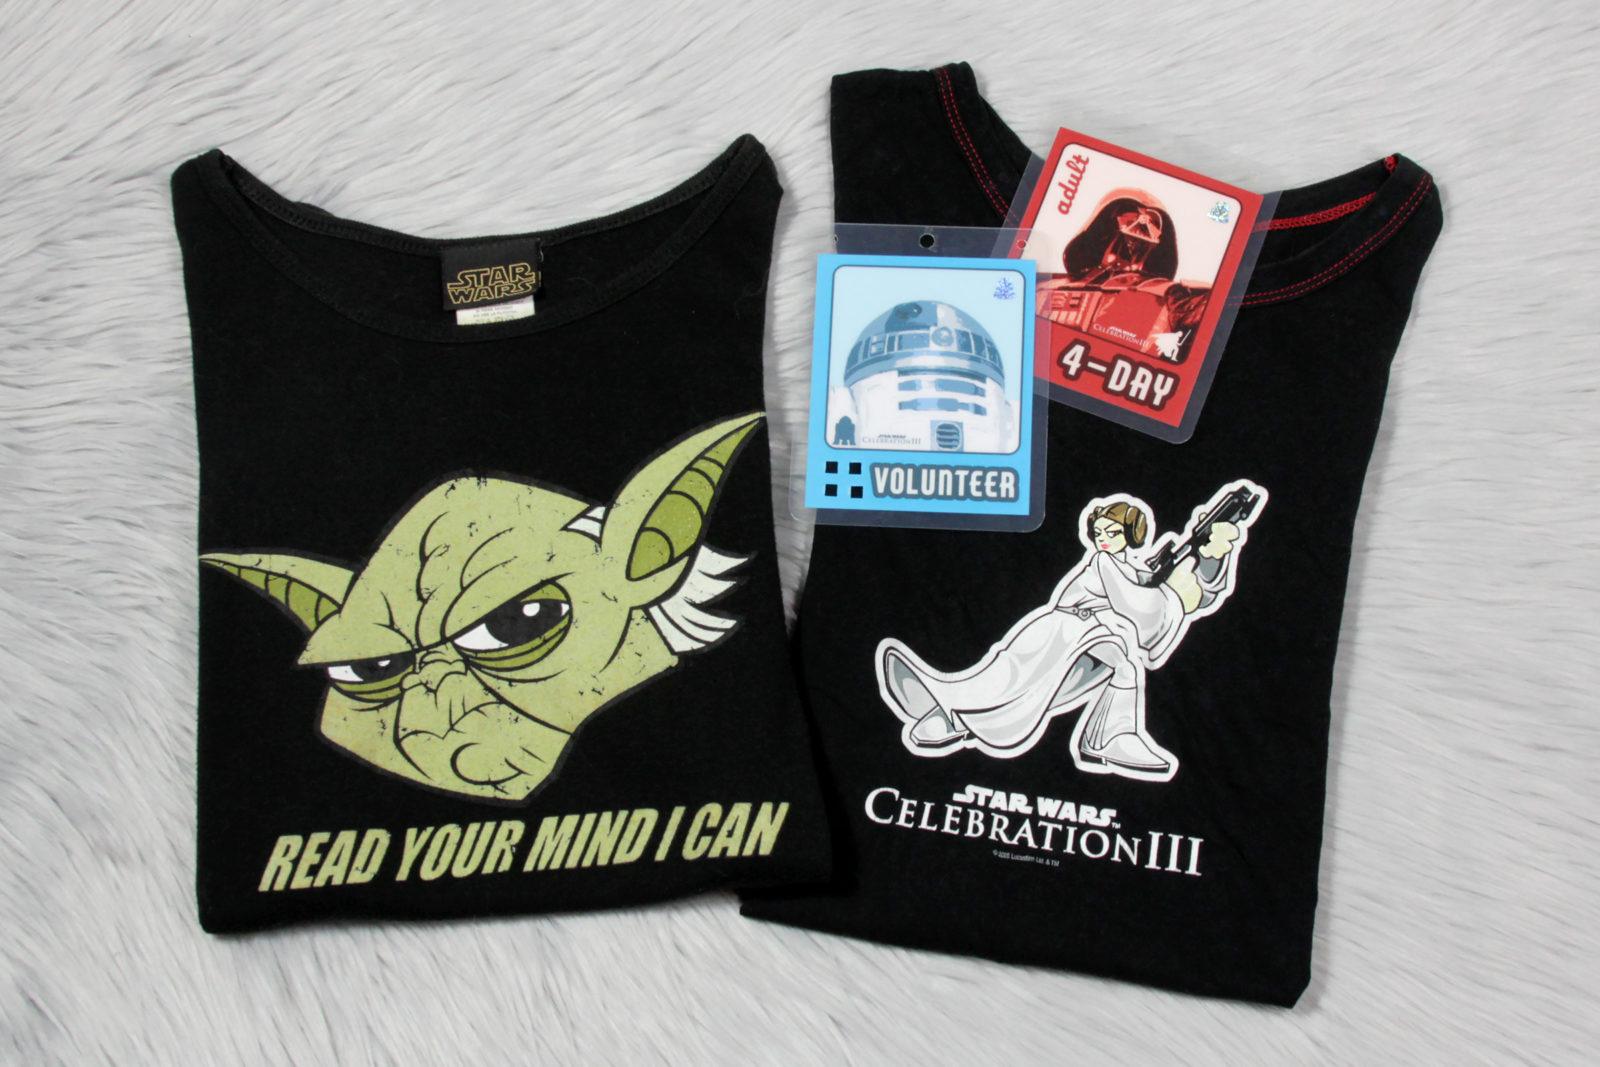 Celebration III T-Shirts and Badges